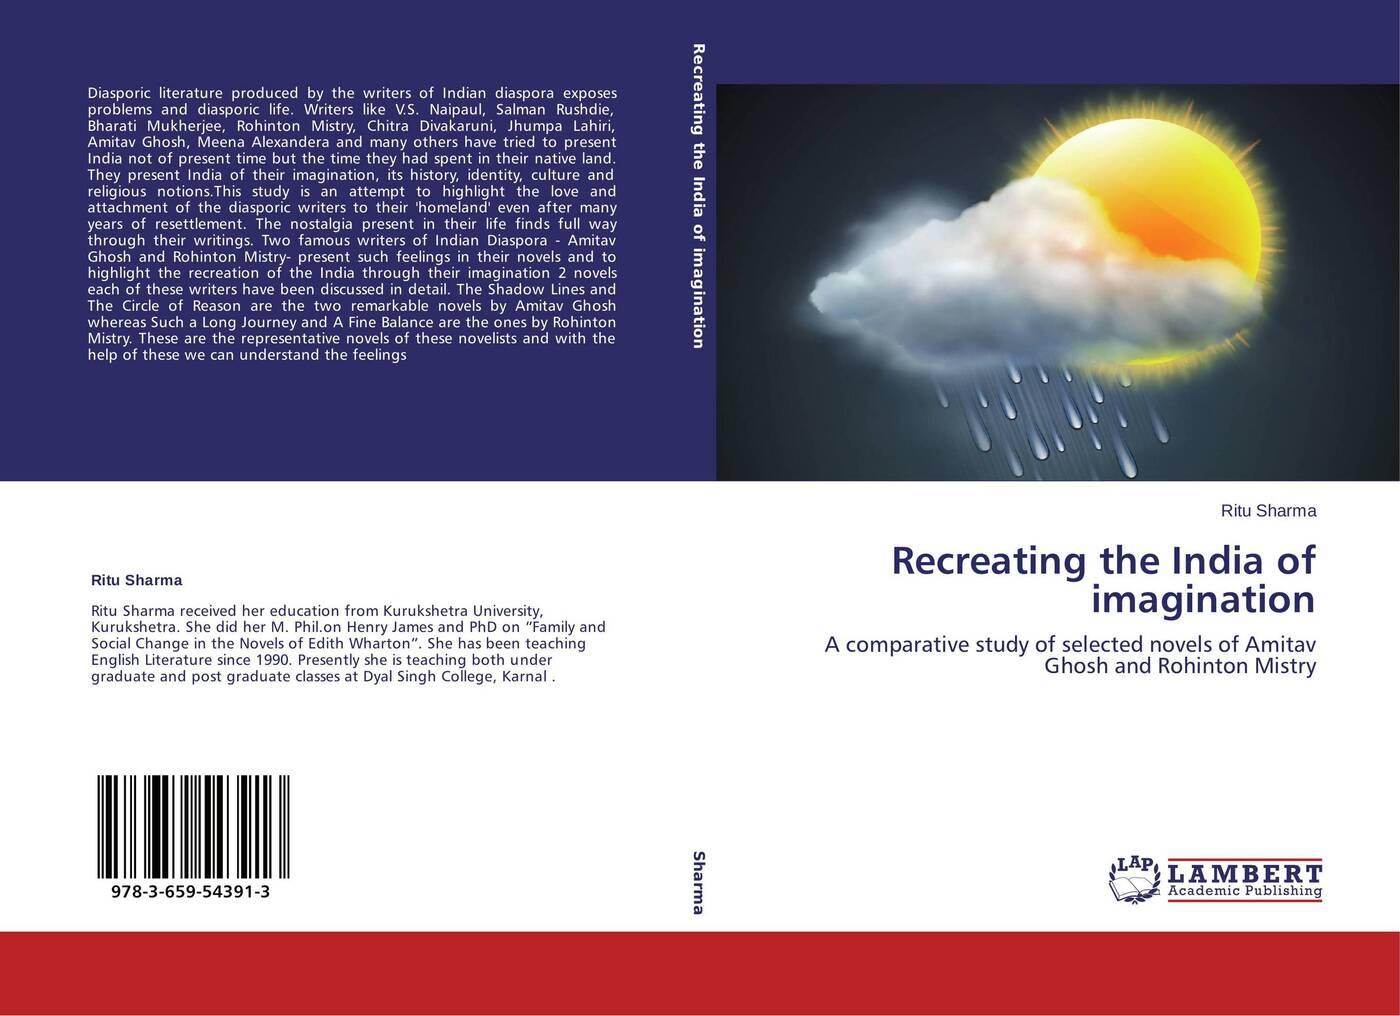 Ritu Sharma Recreating the India of imagination